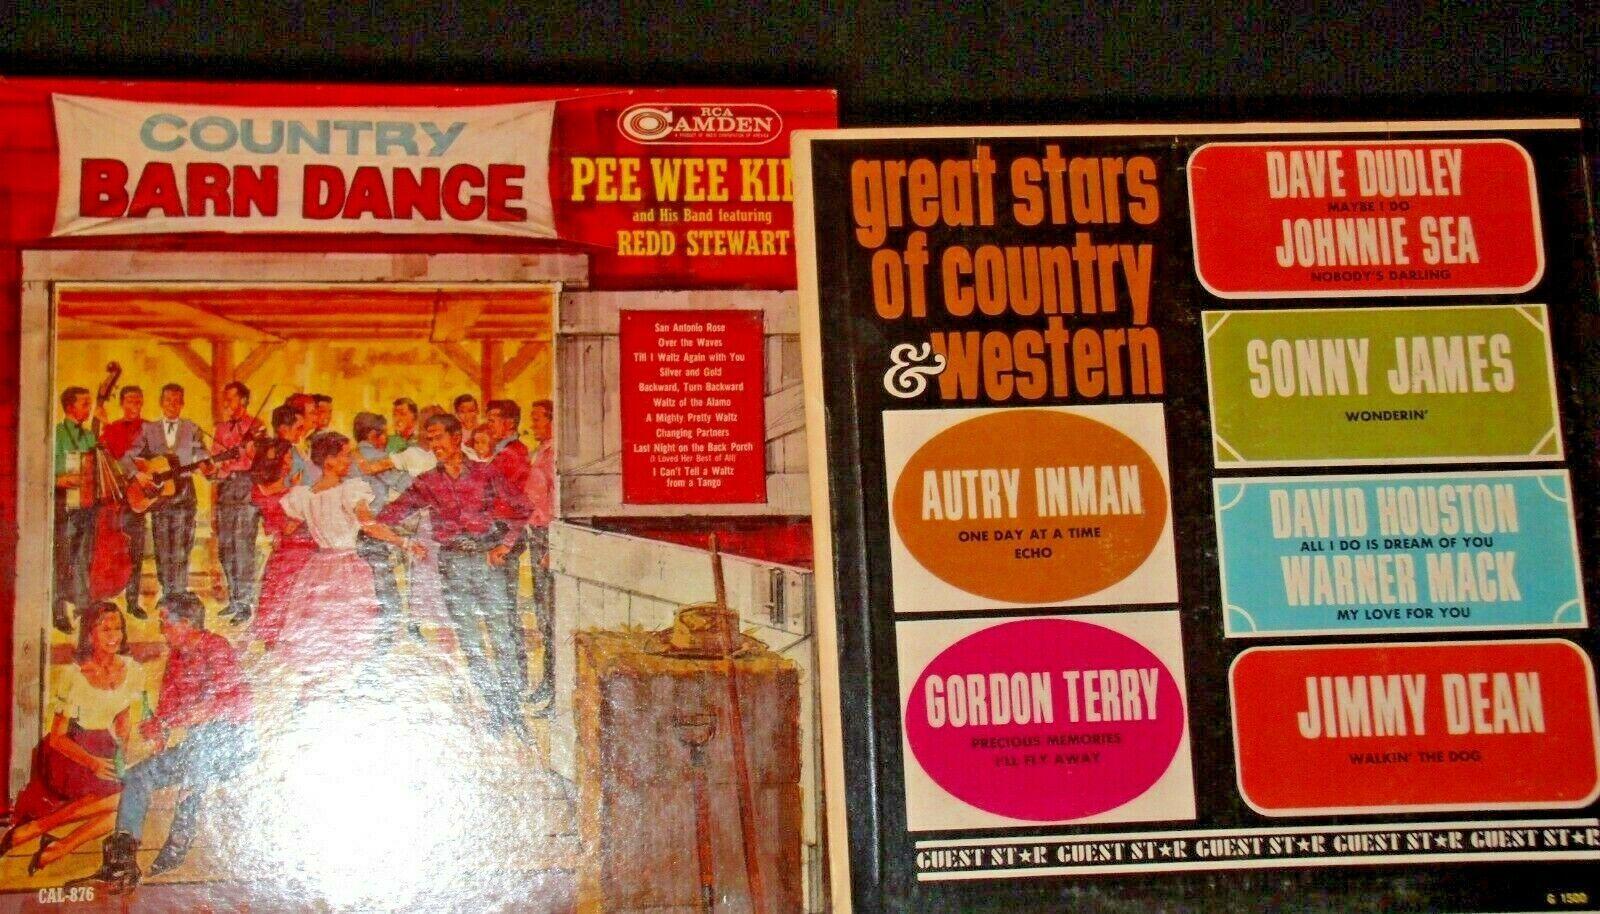 Country barn dance Pee Wee Kingand The Country Folks Eldon Combs AA-192003 Vint